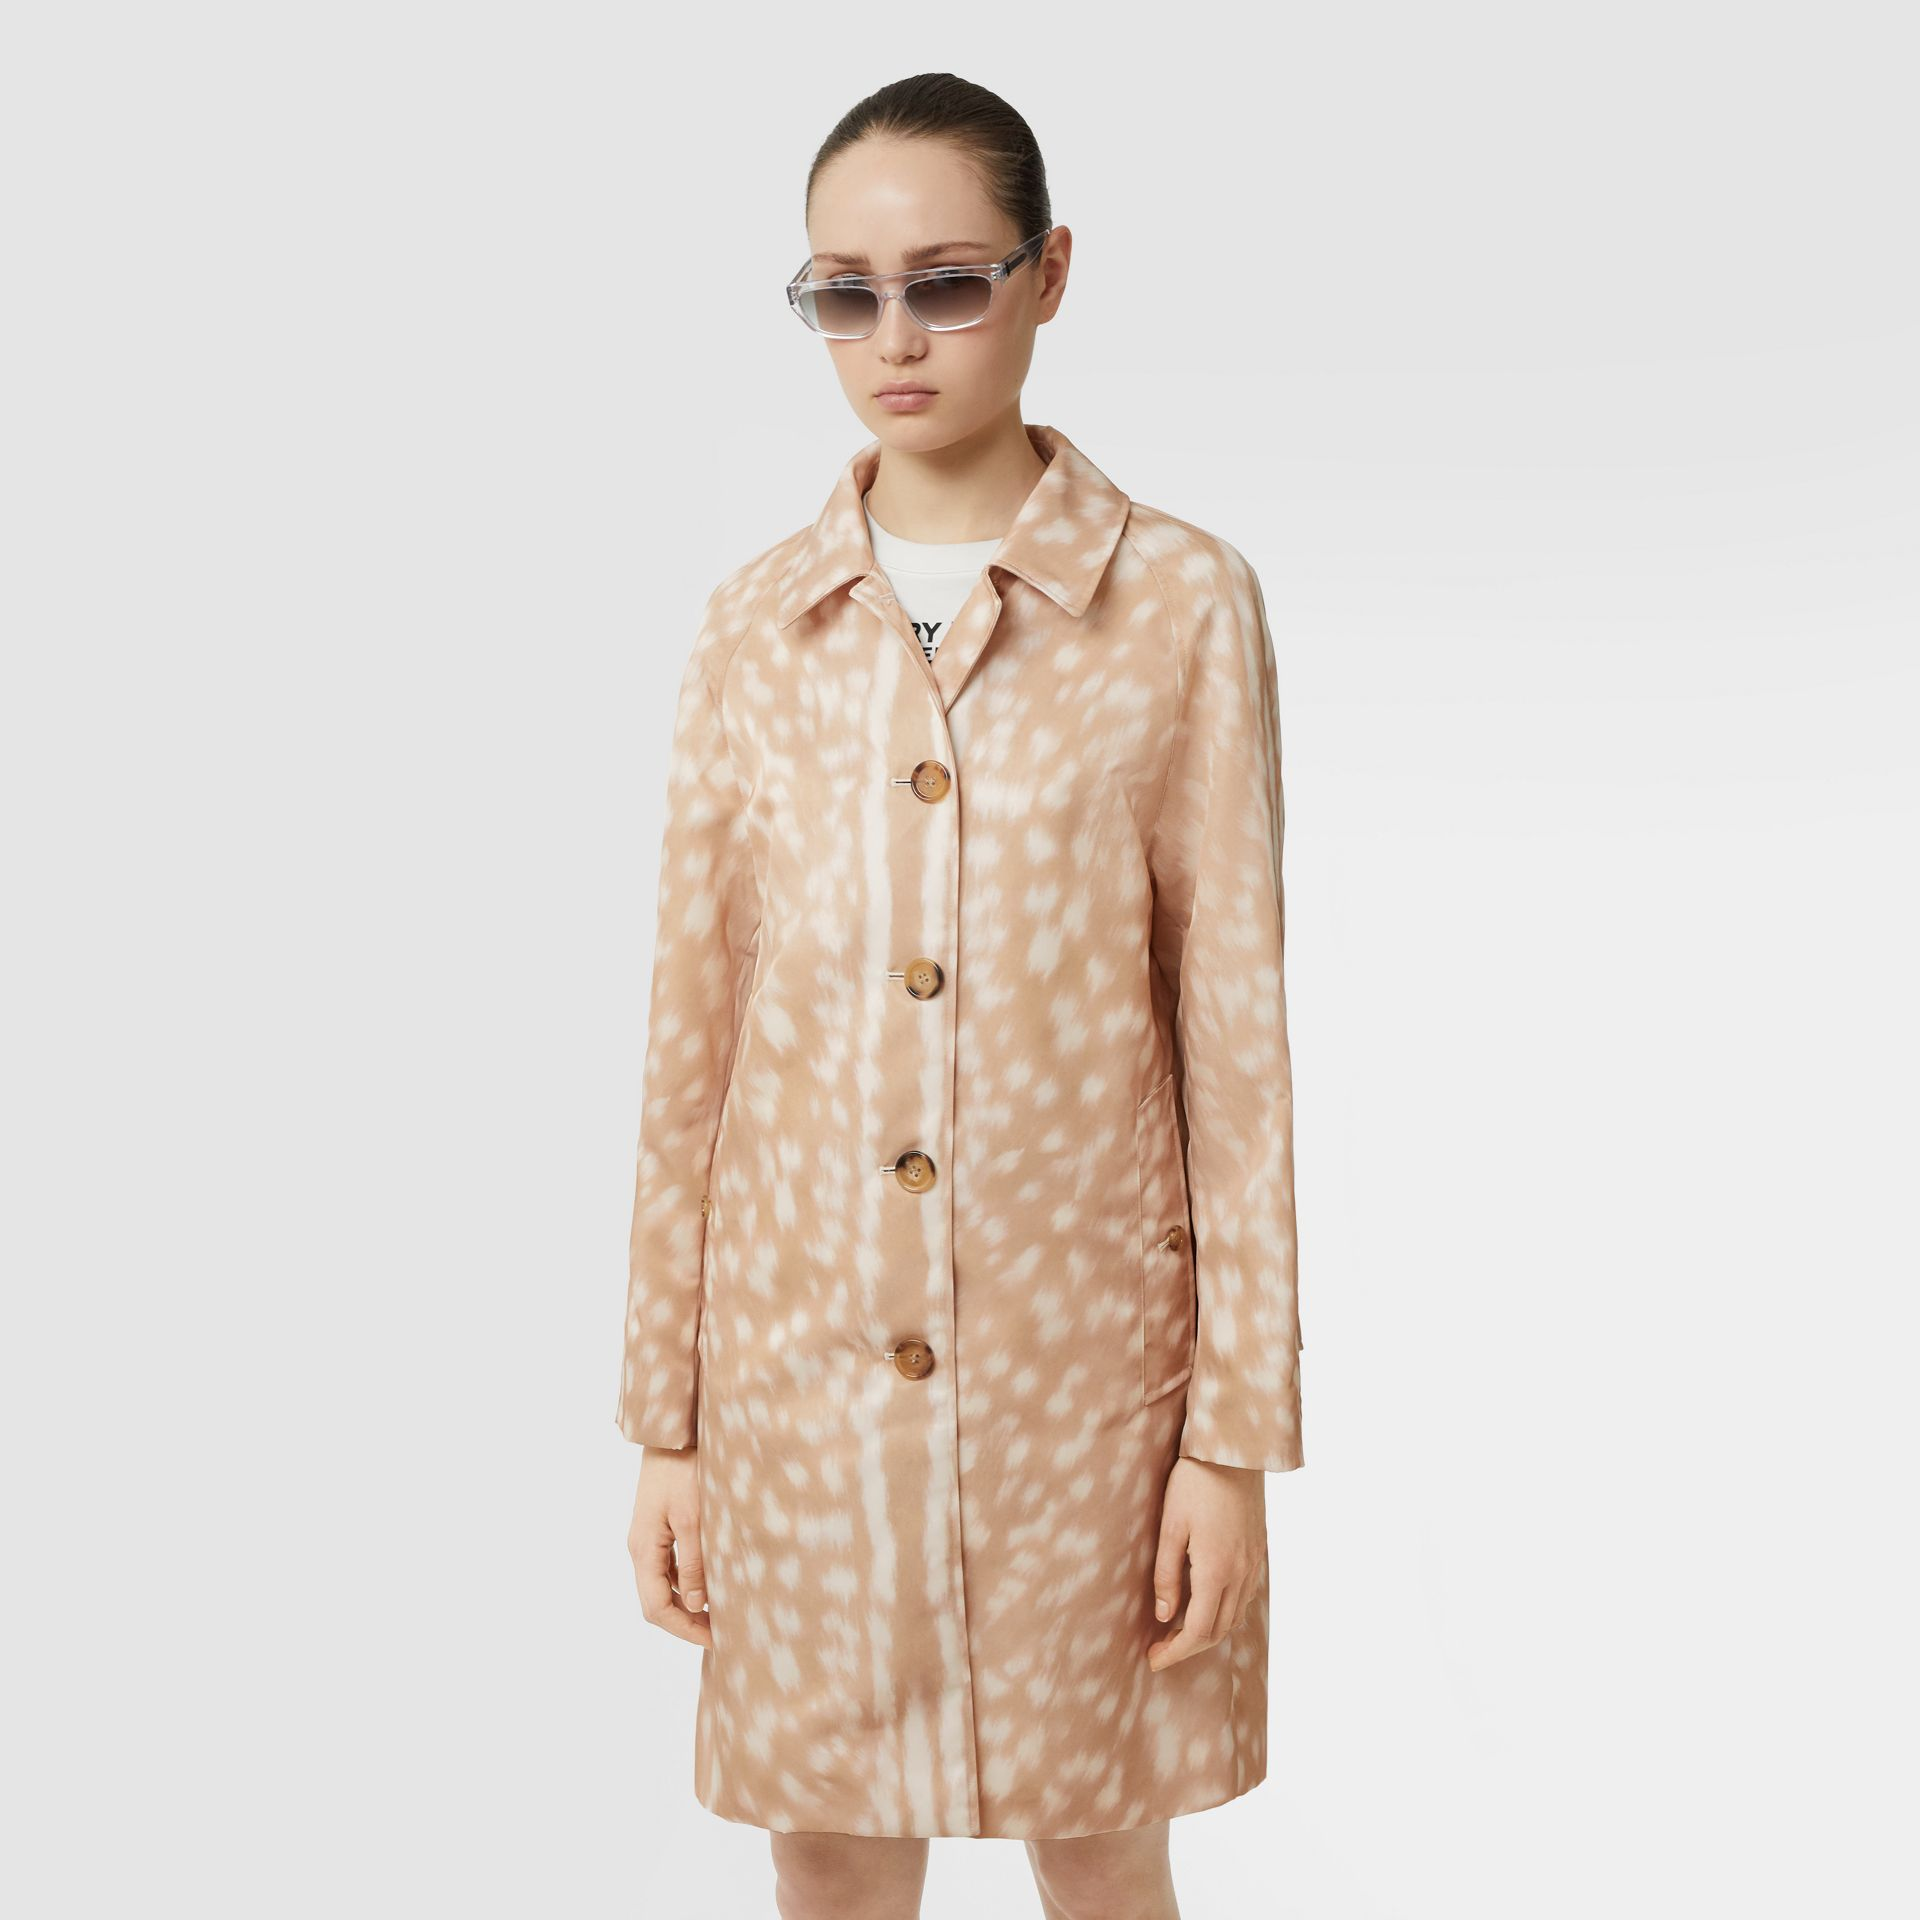 Deer Print Nylon Car Coat in Soft Fawn - Women | Burberry United Kingdom - gallery image 5